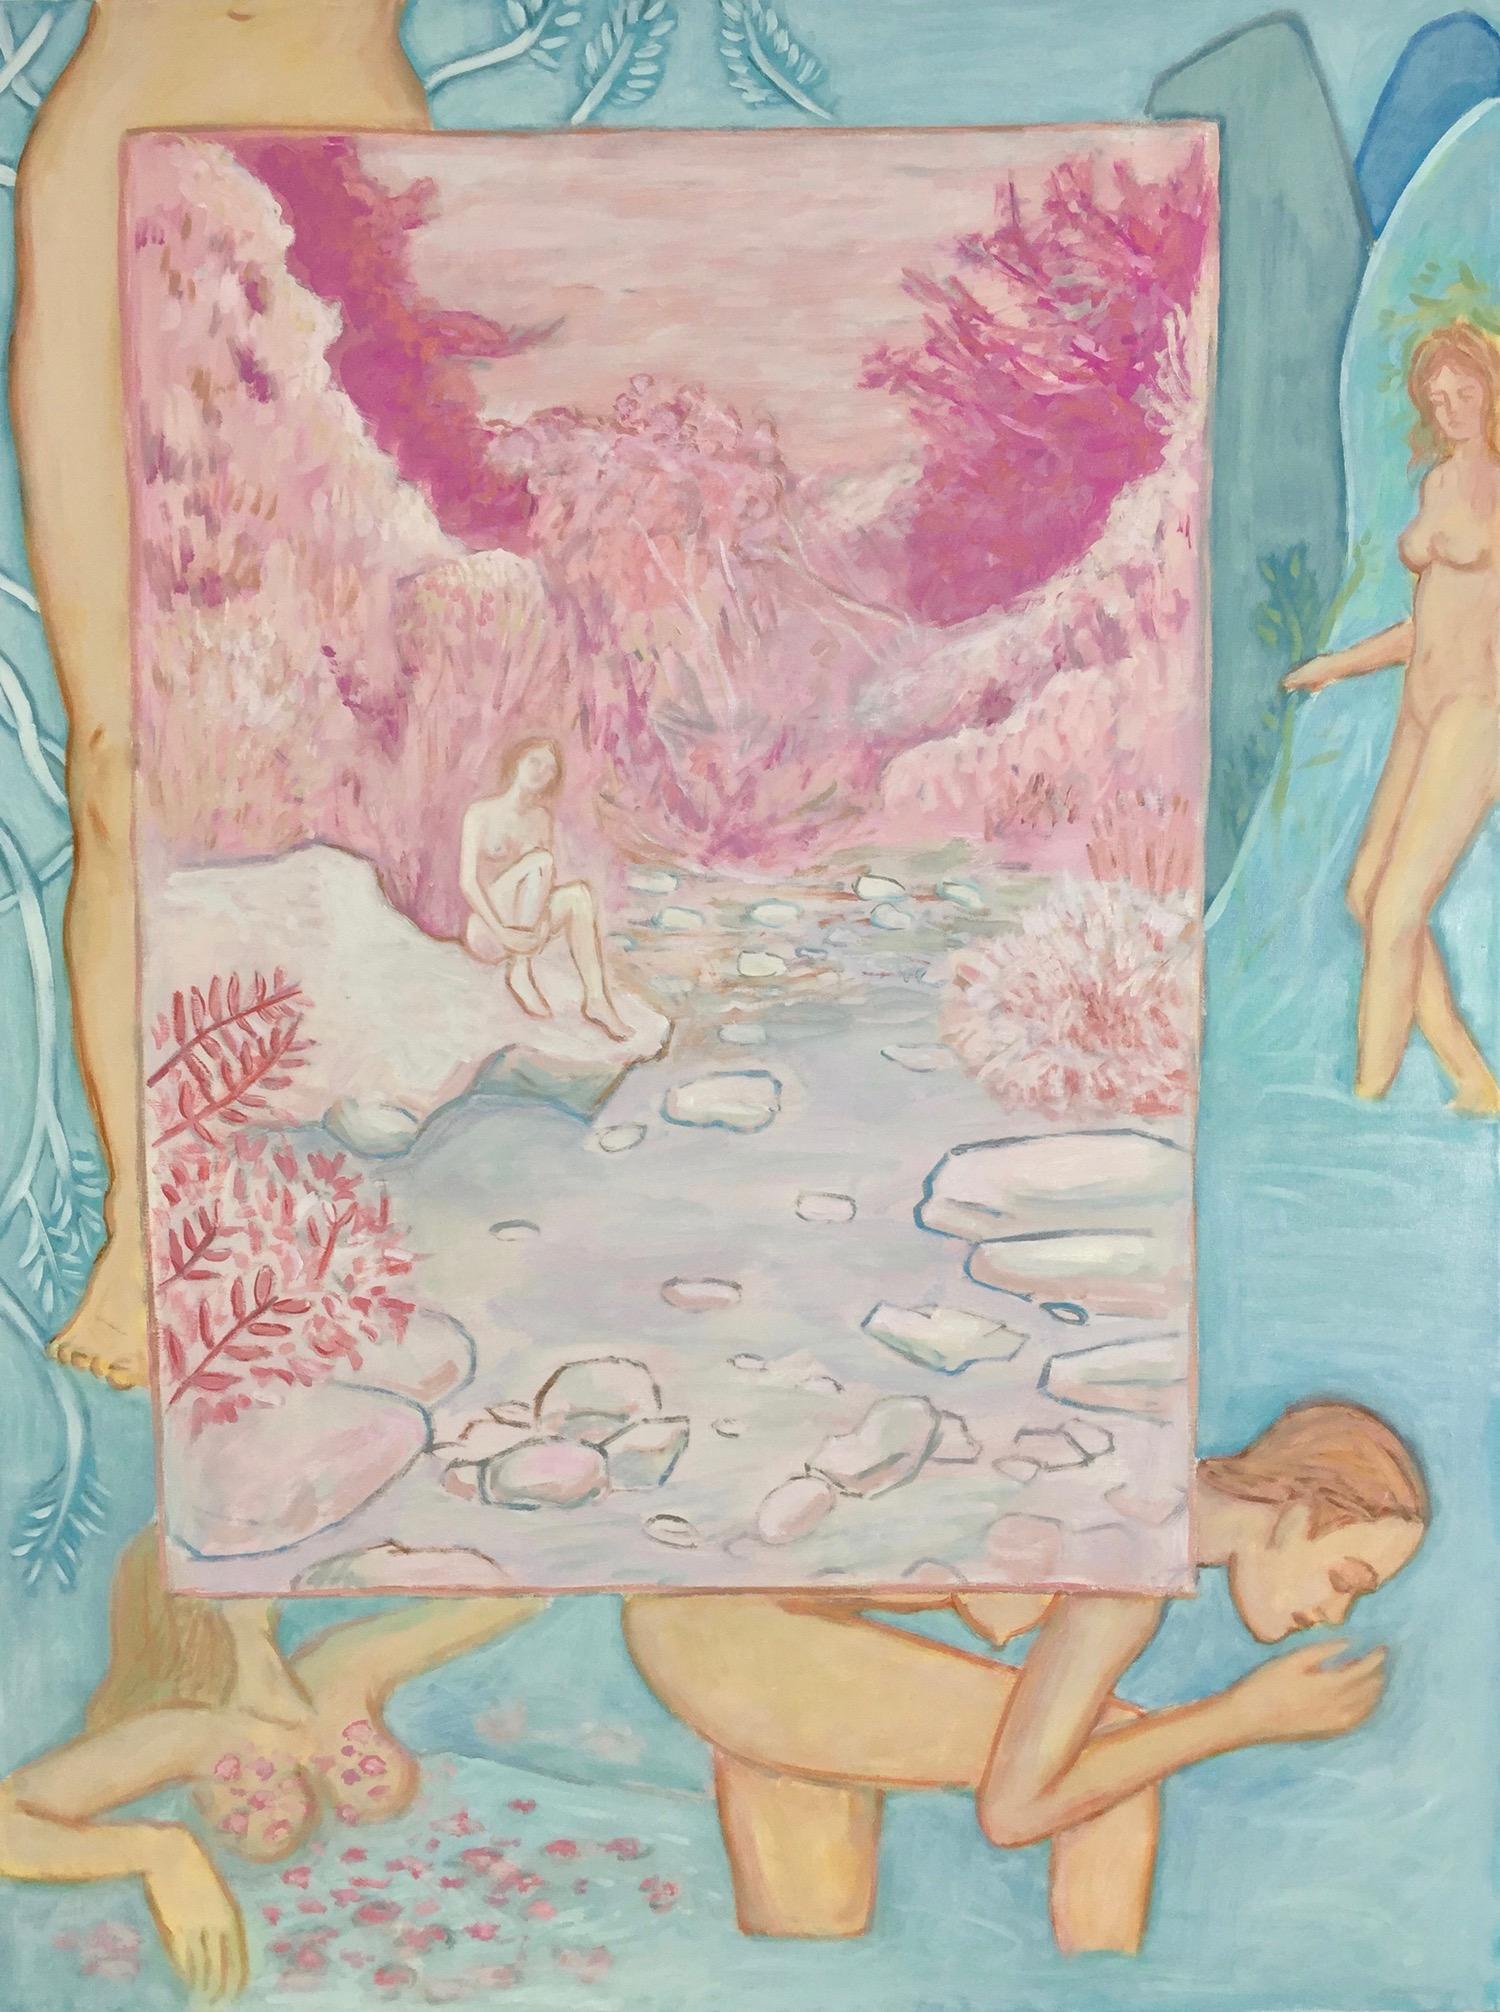 Aphrodite's Garden (The Pink Madness)